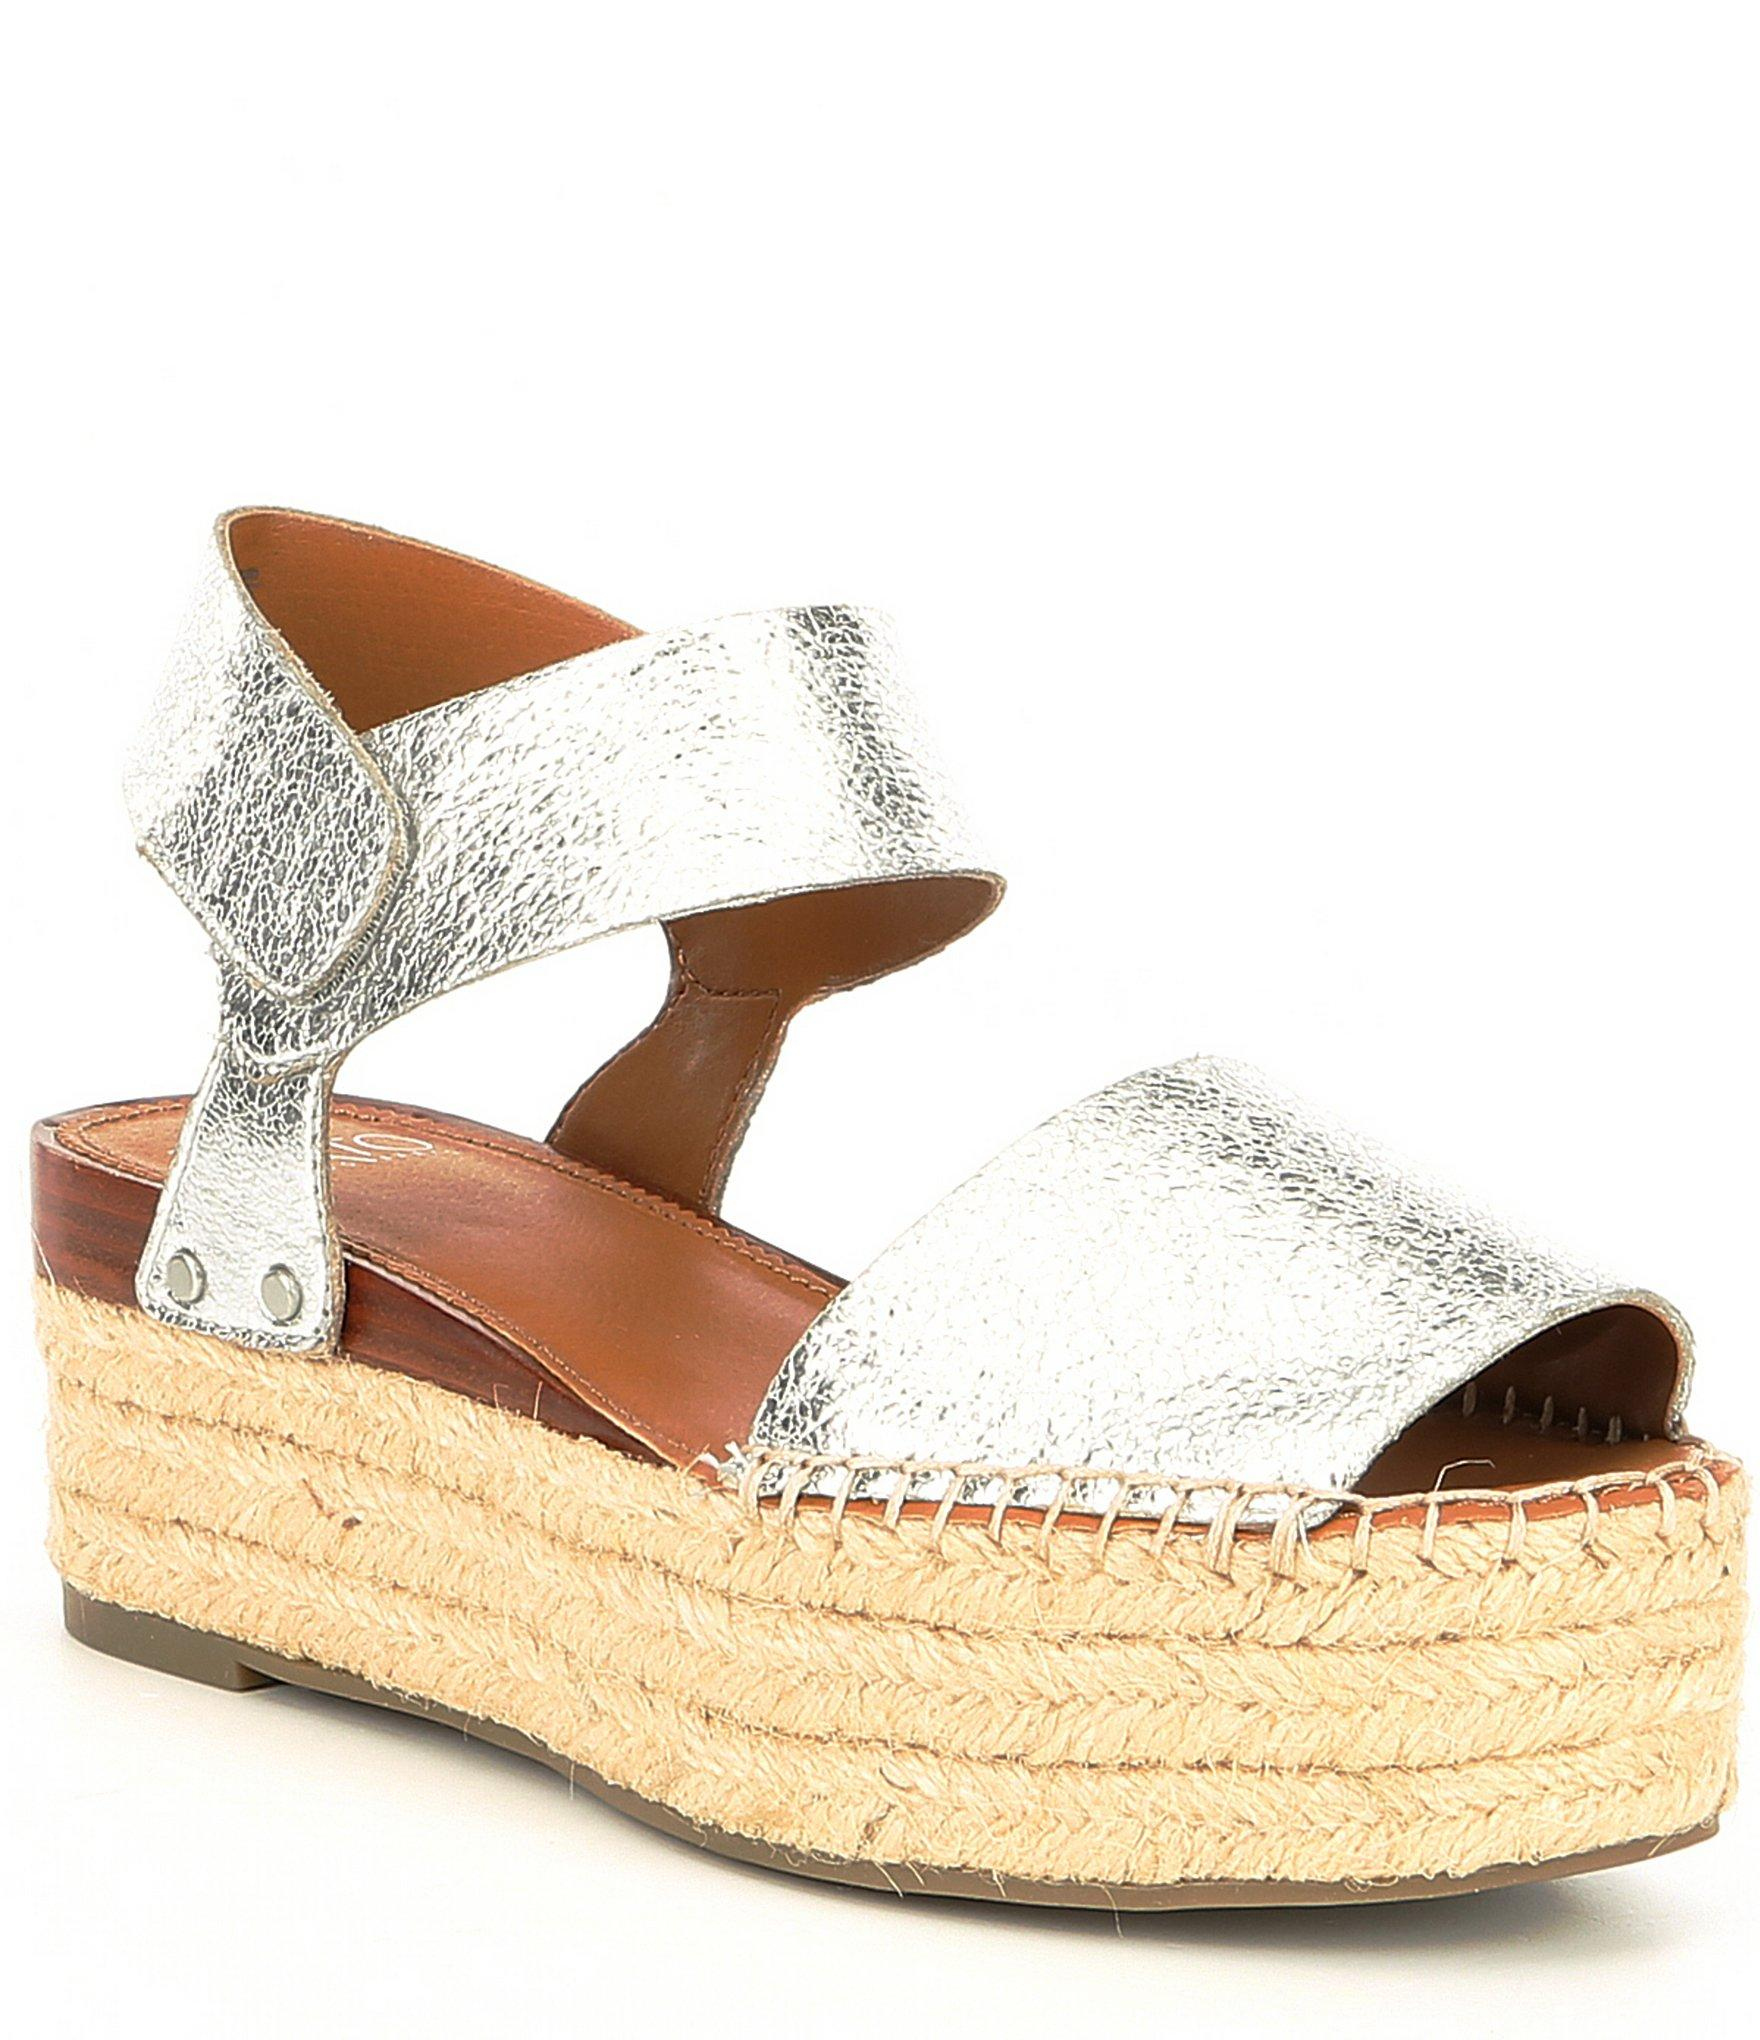 bce79d400957 Lyst - Franco Sarto Sarto By Leo Espadrille Platform Sandals in Metallic